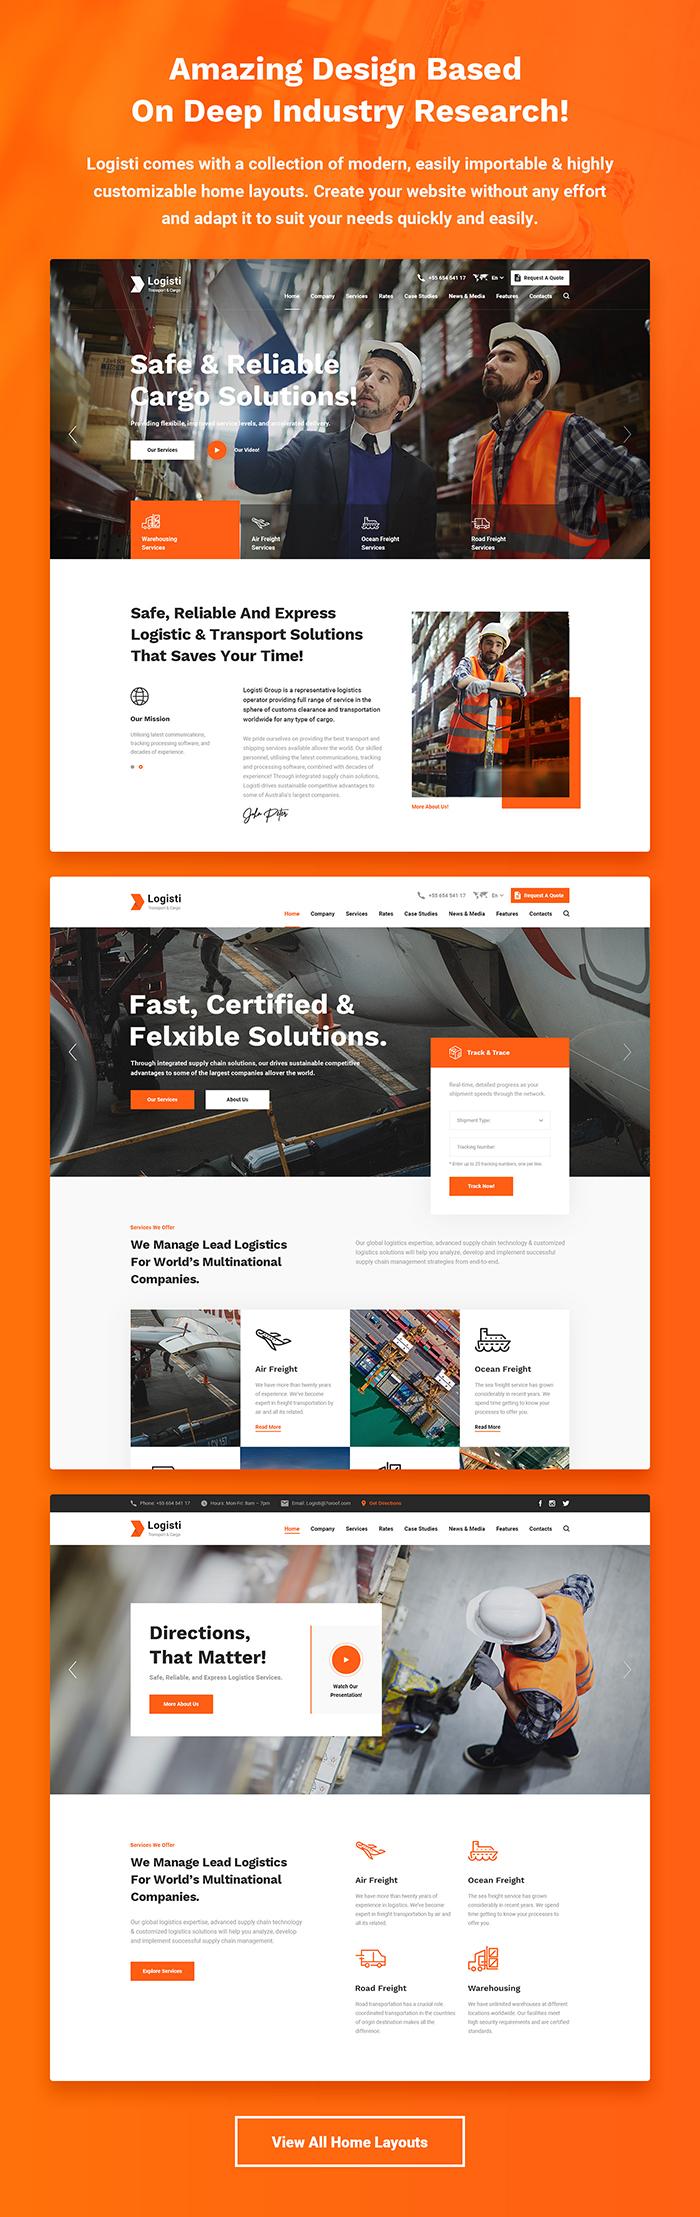 Logisti - Logistics & Transport WordPress Theme - 6